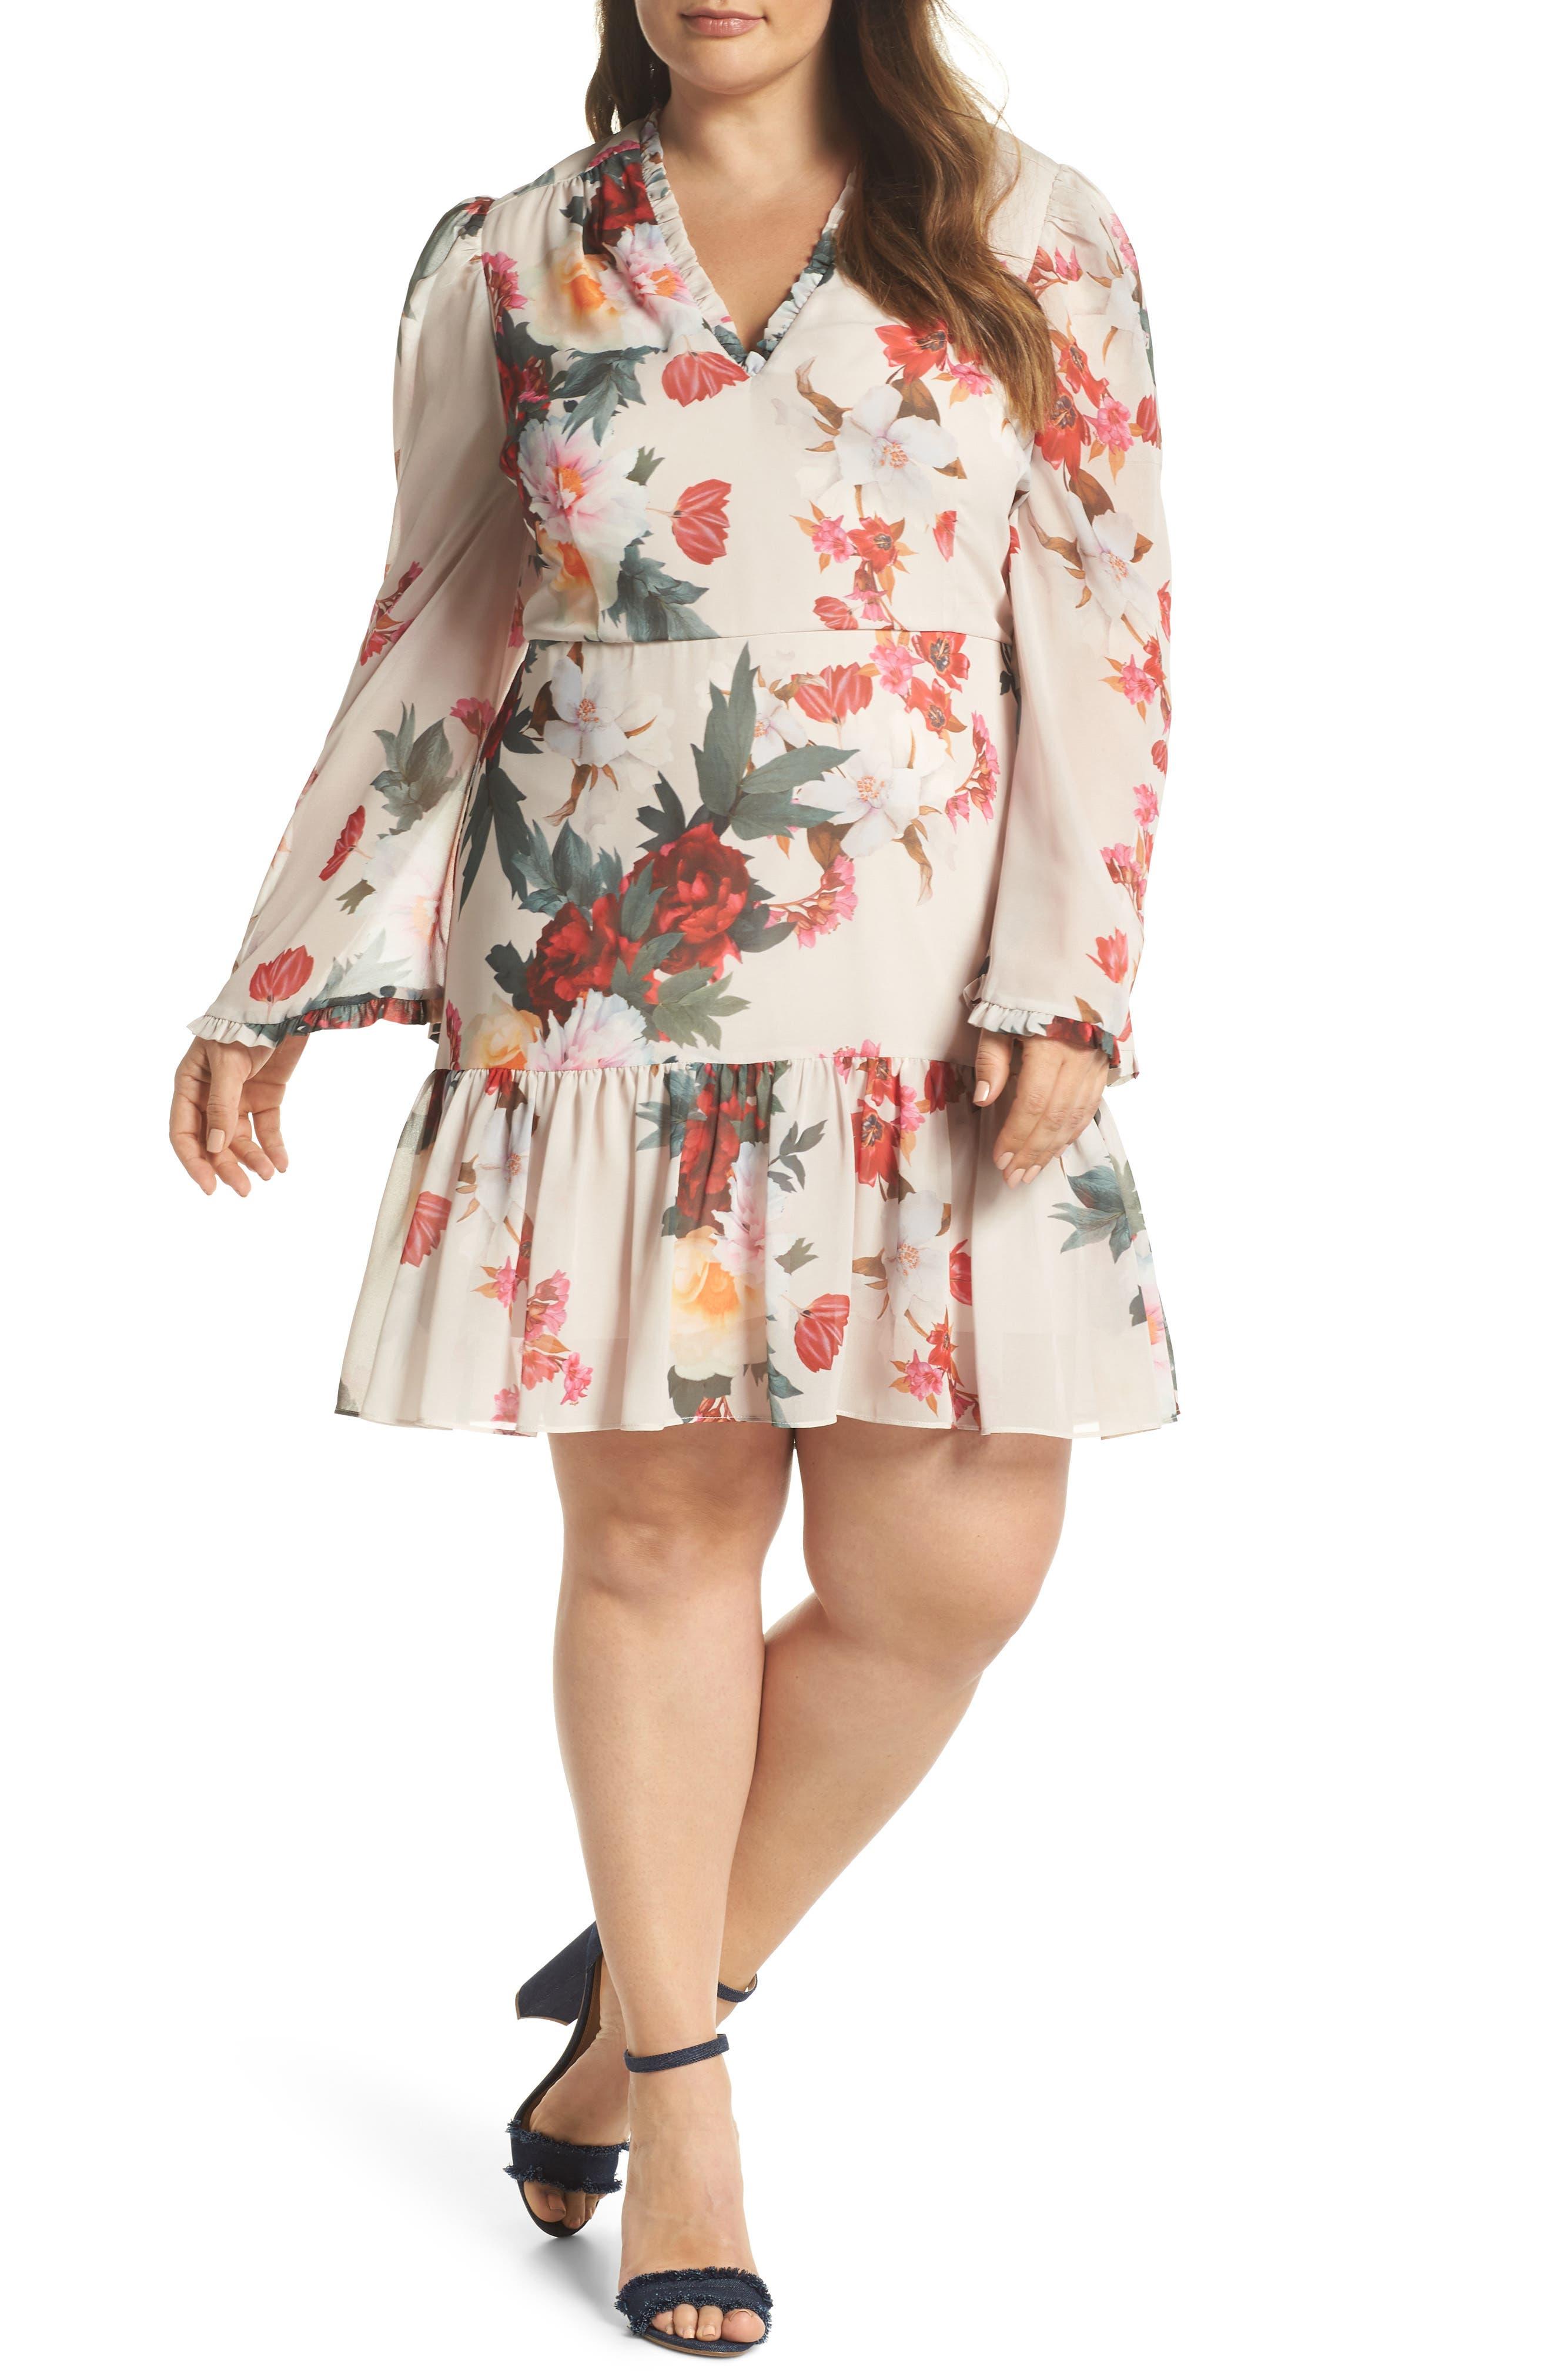 COOPER ST Rosa Floral Chiffon Minidress, Main, color, 250